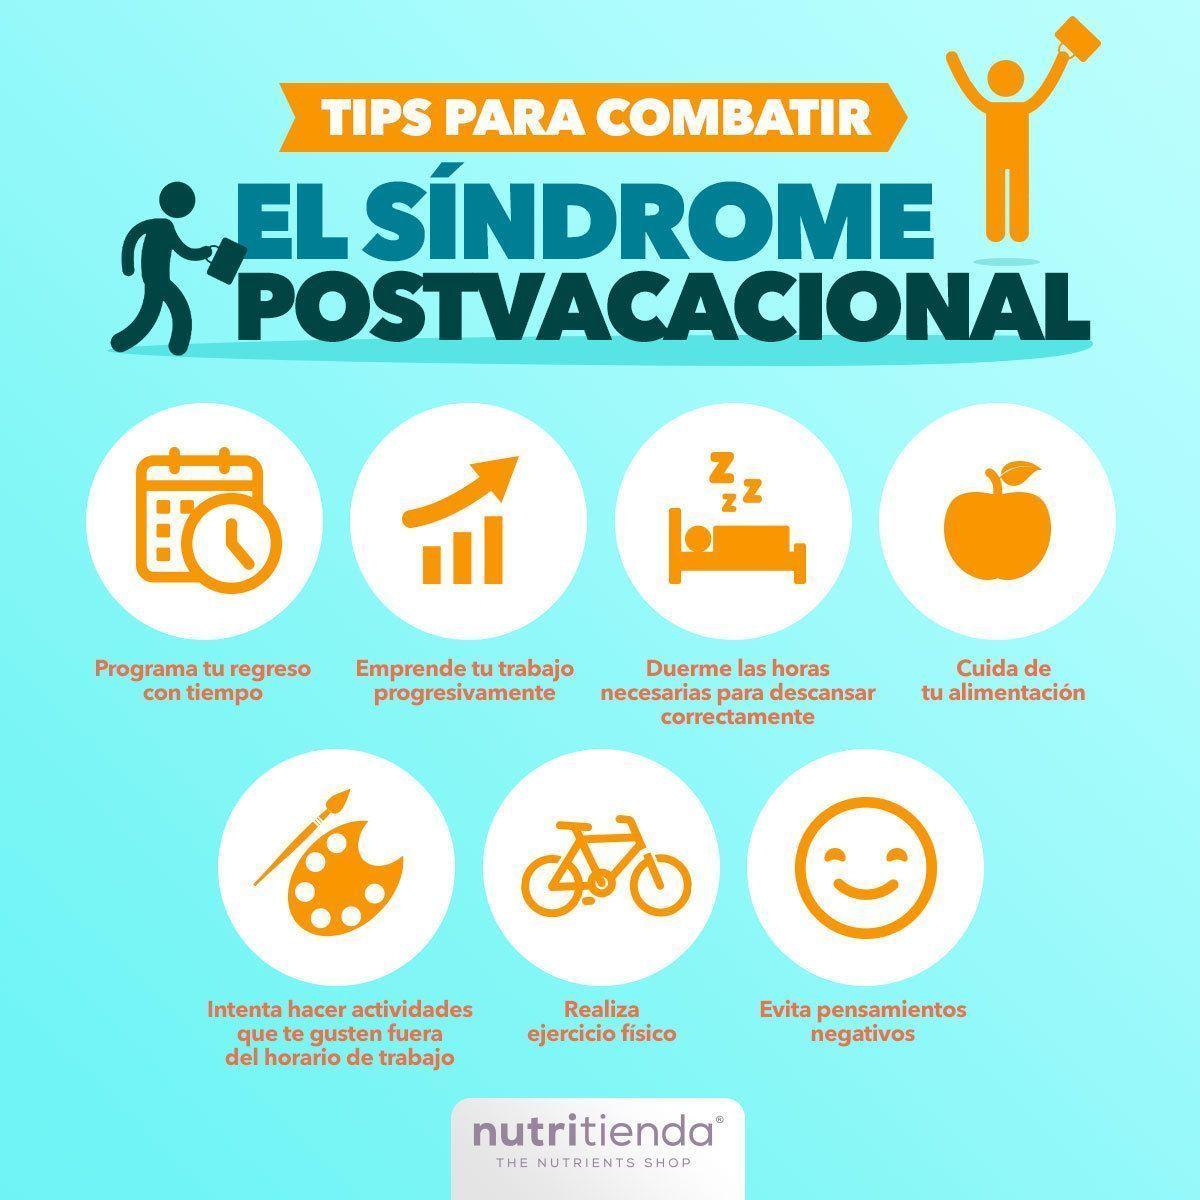 infografía tips para combatir el síndrome postvacacional